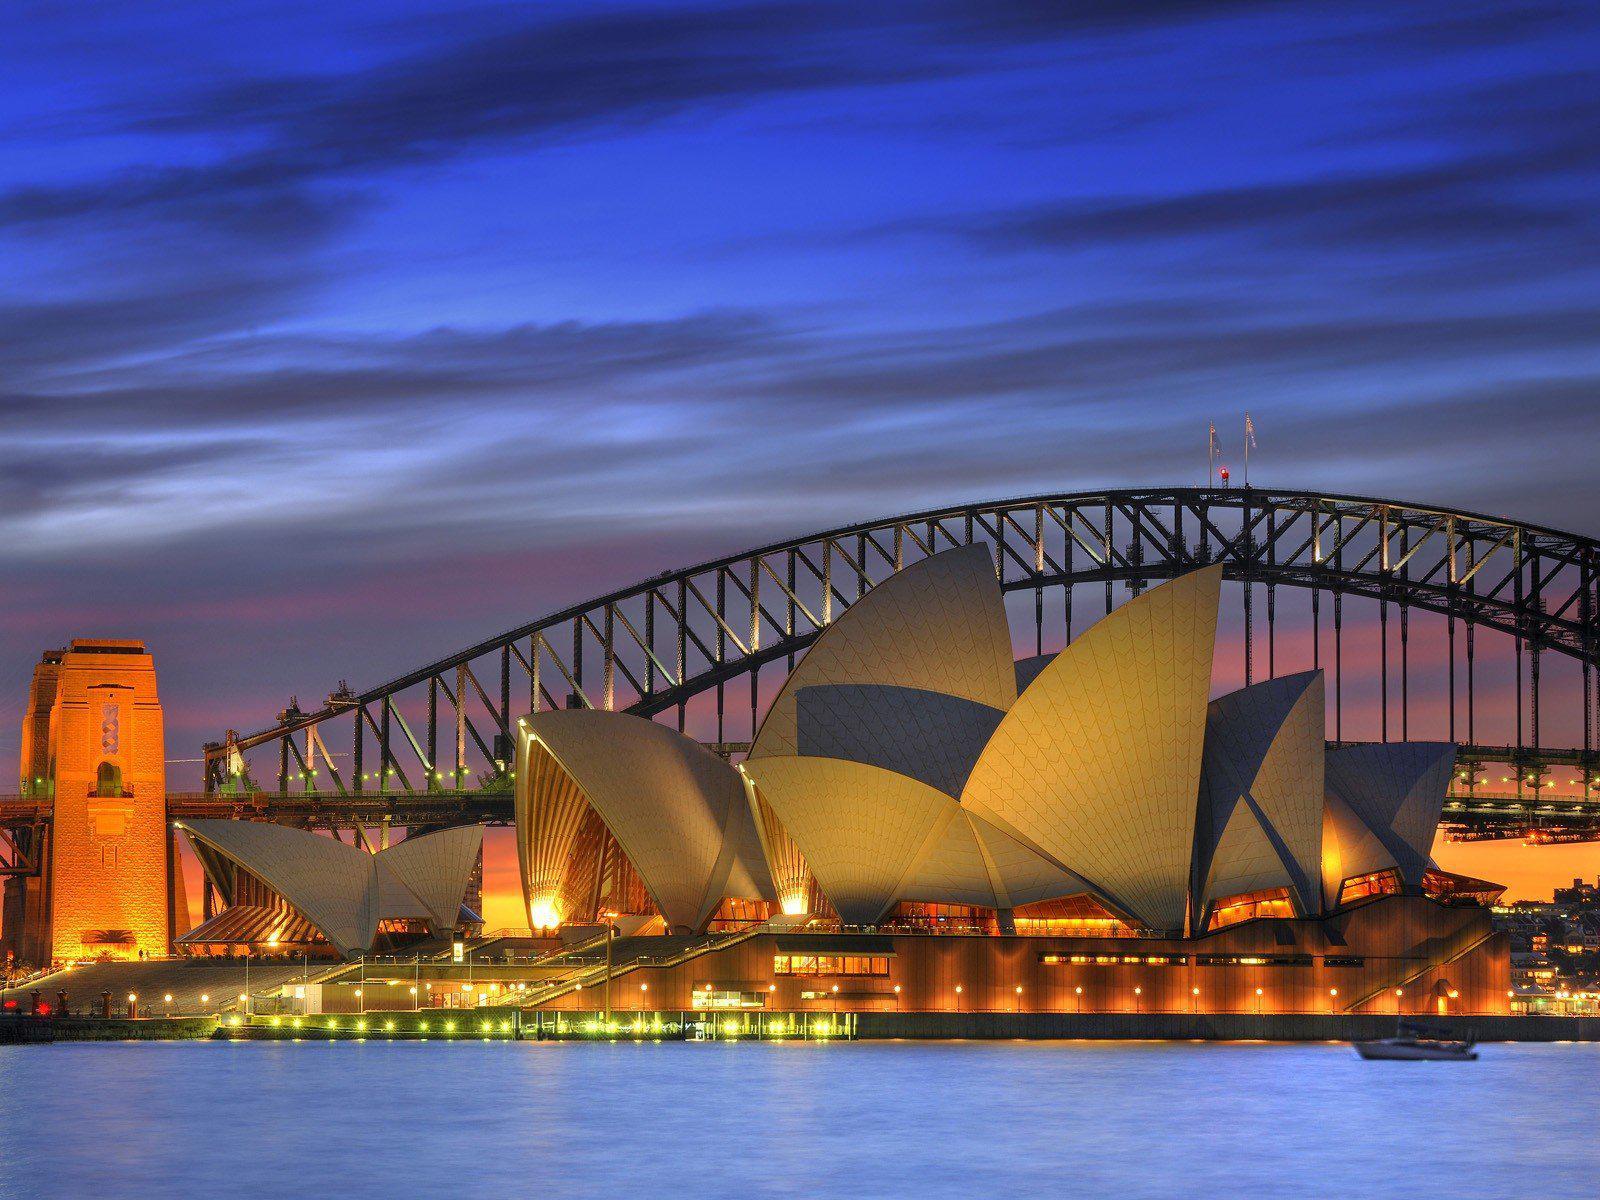 HD Night Opera House Australia Harbor Sydney Harbour